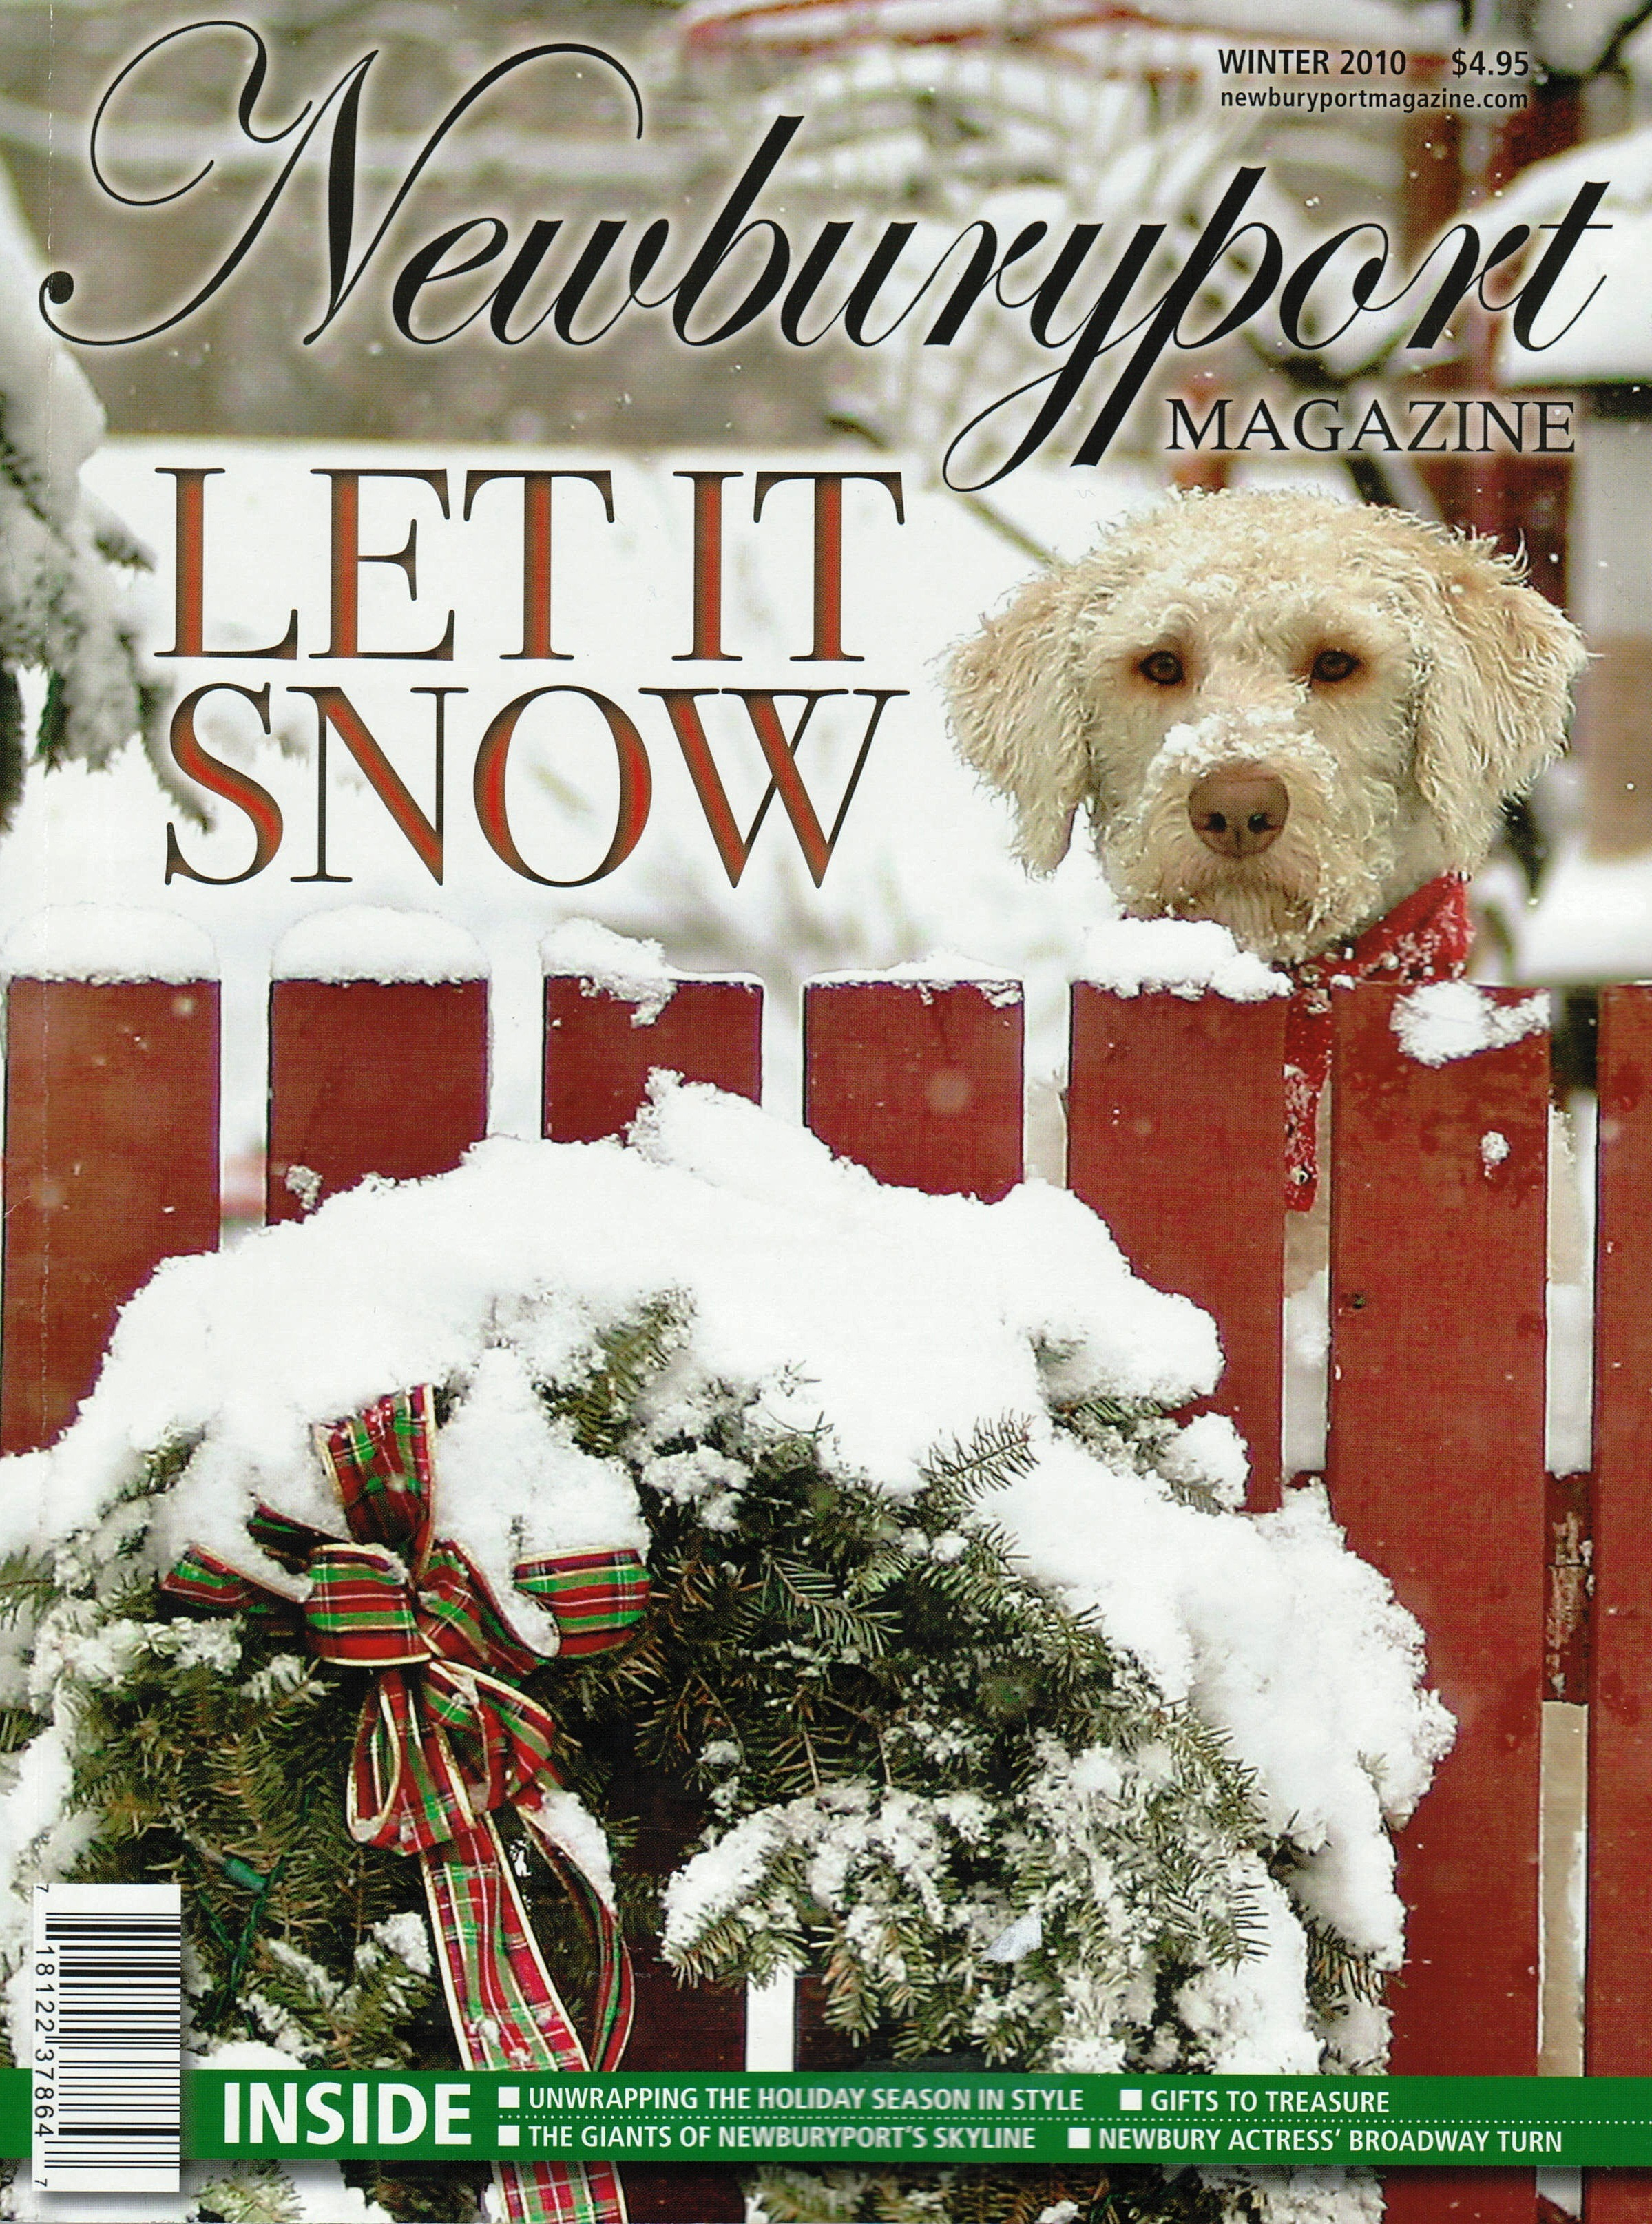 Newburyport Magazine